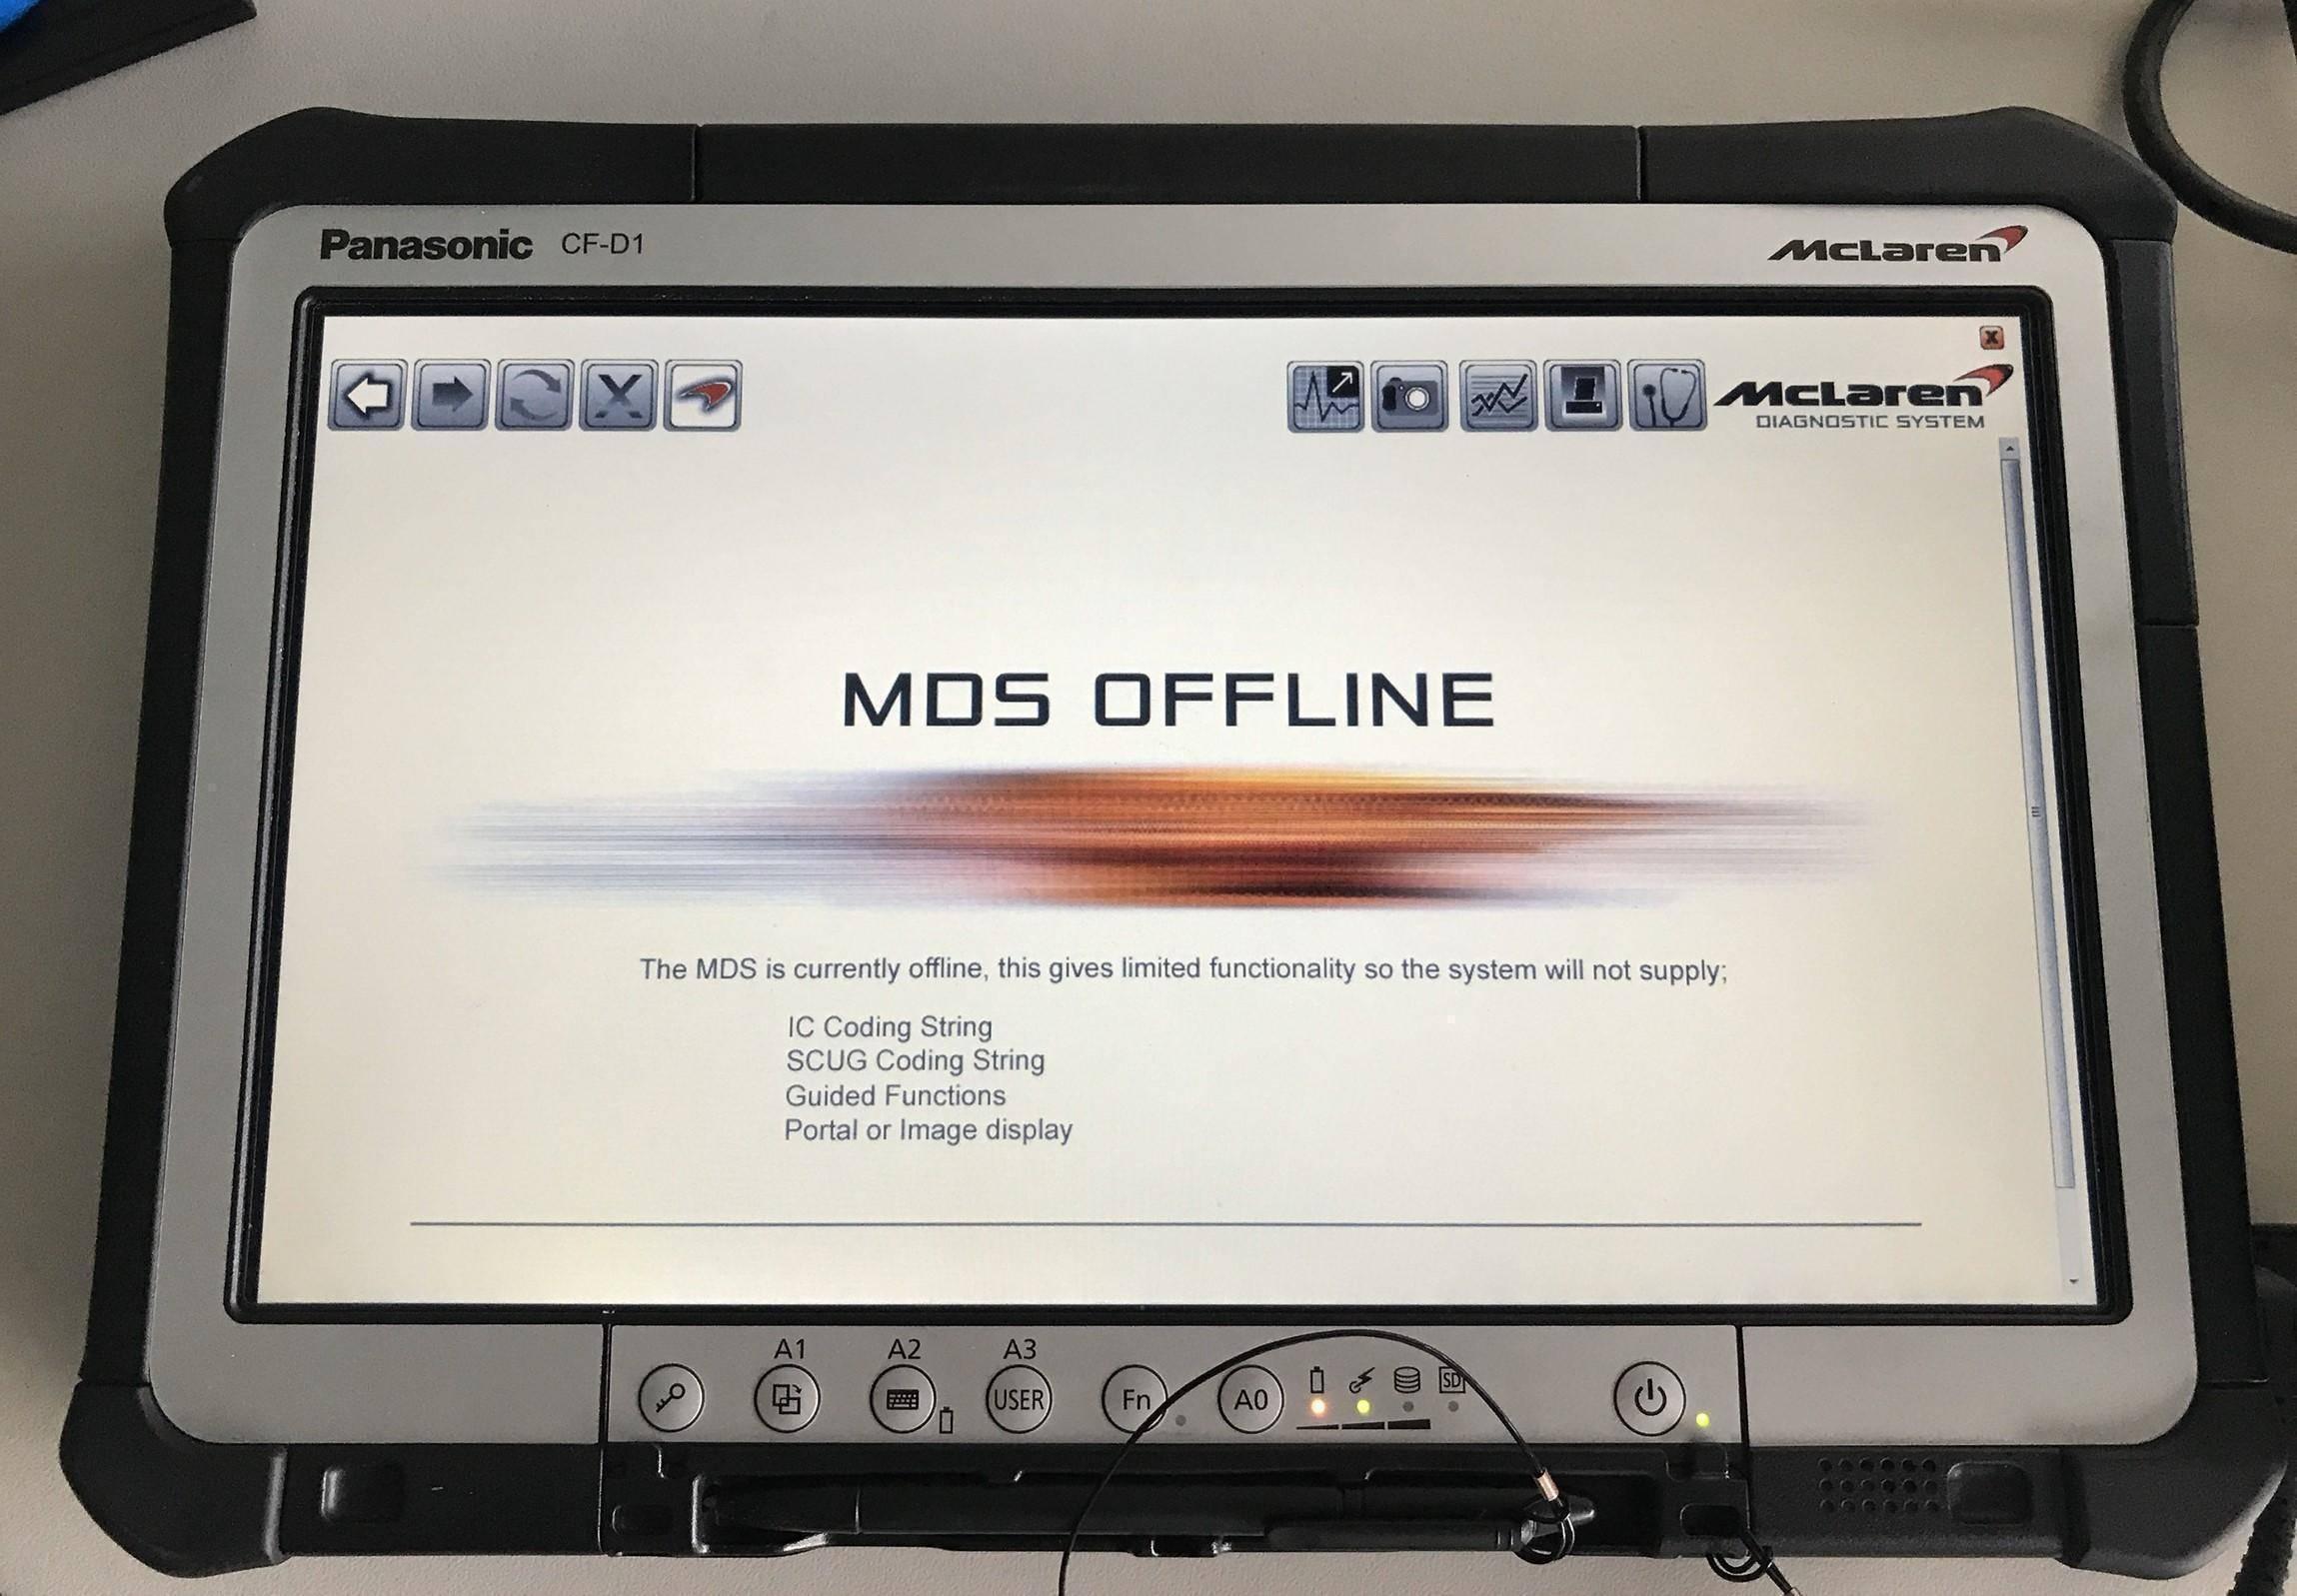 MCLAREN原廠工程版診斷電腦系統。